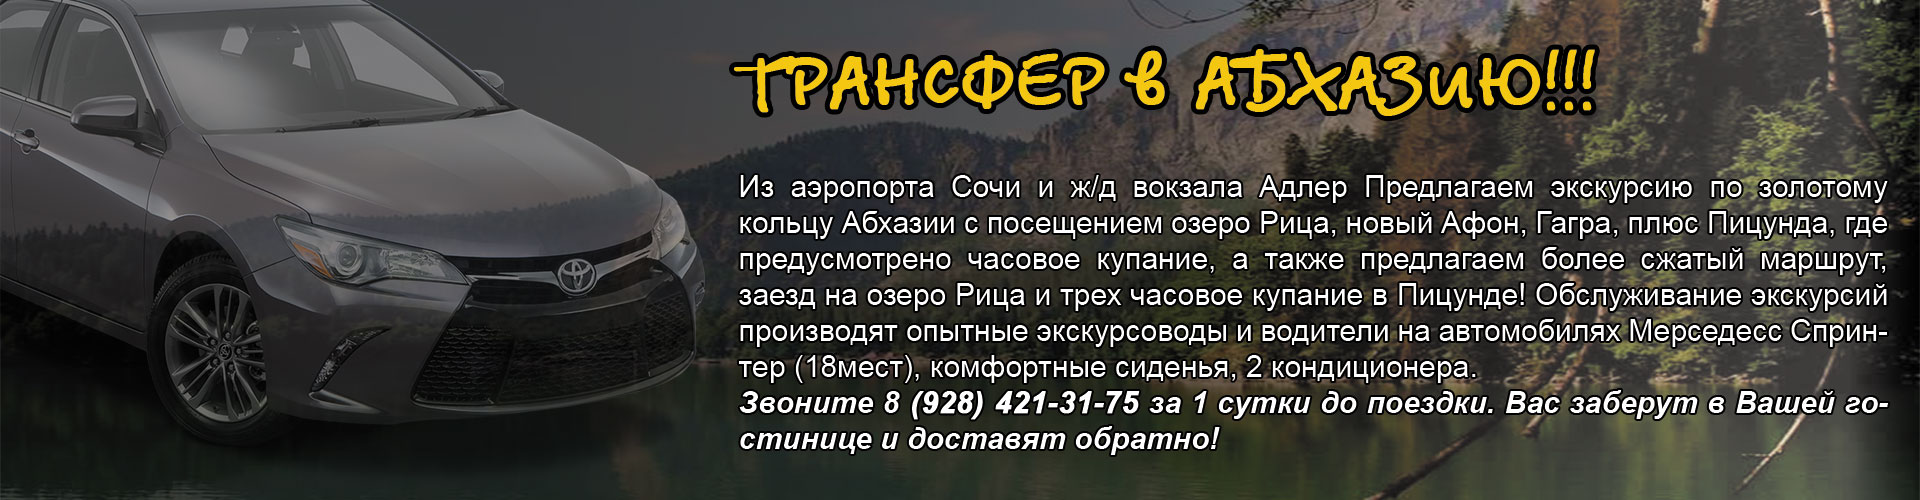 Аэропорт Сочи - экскурсия по золотому кольцу Абхазии на автомобиле.